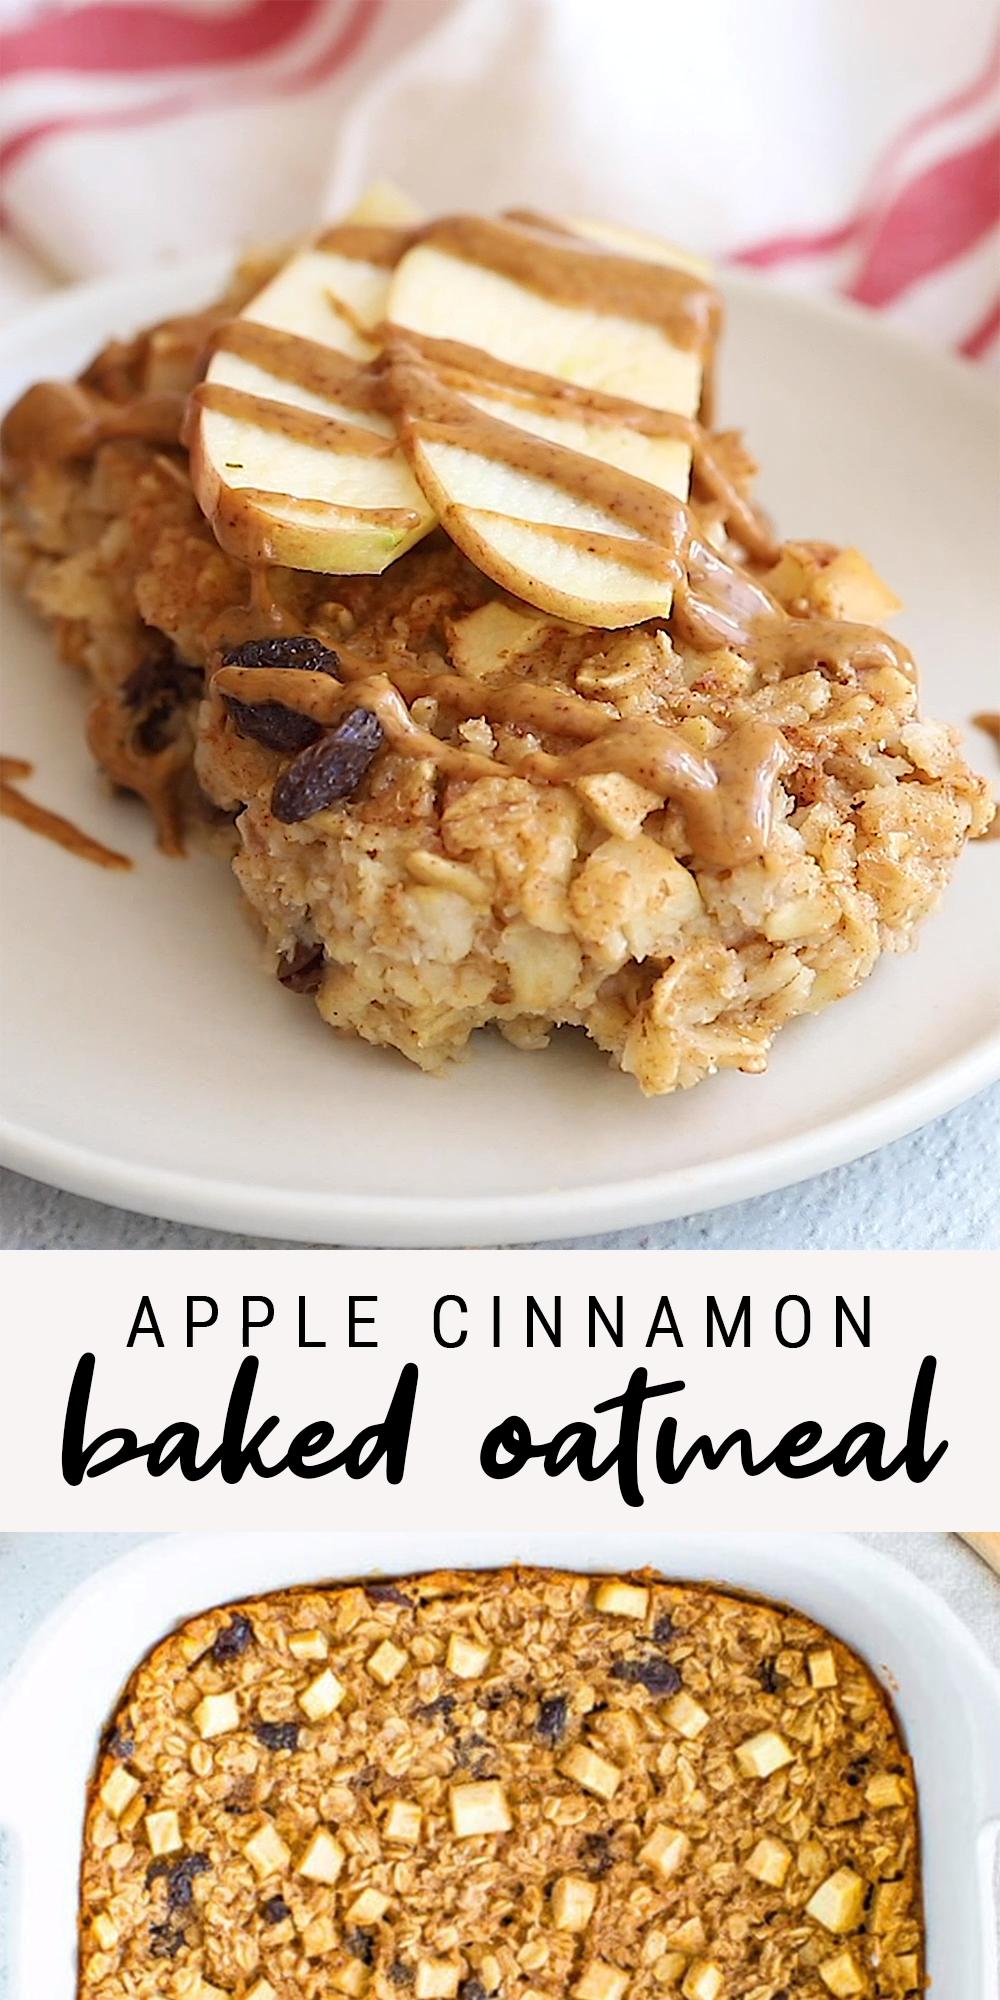 Photo of Apple Cinnamon Baked Oatmeal